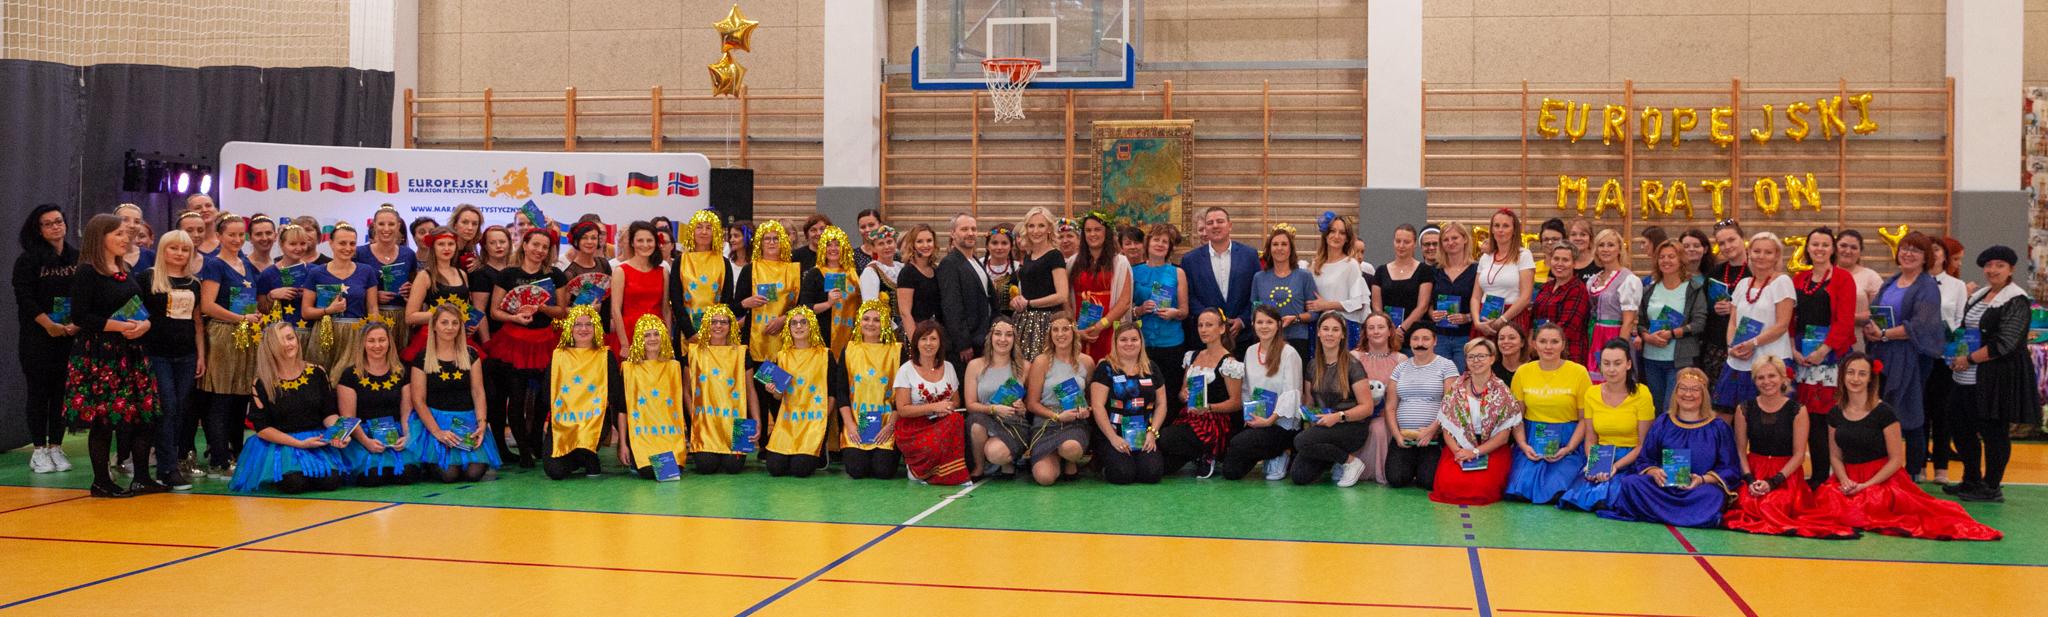 0351_maraton_krakow